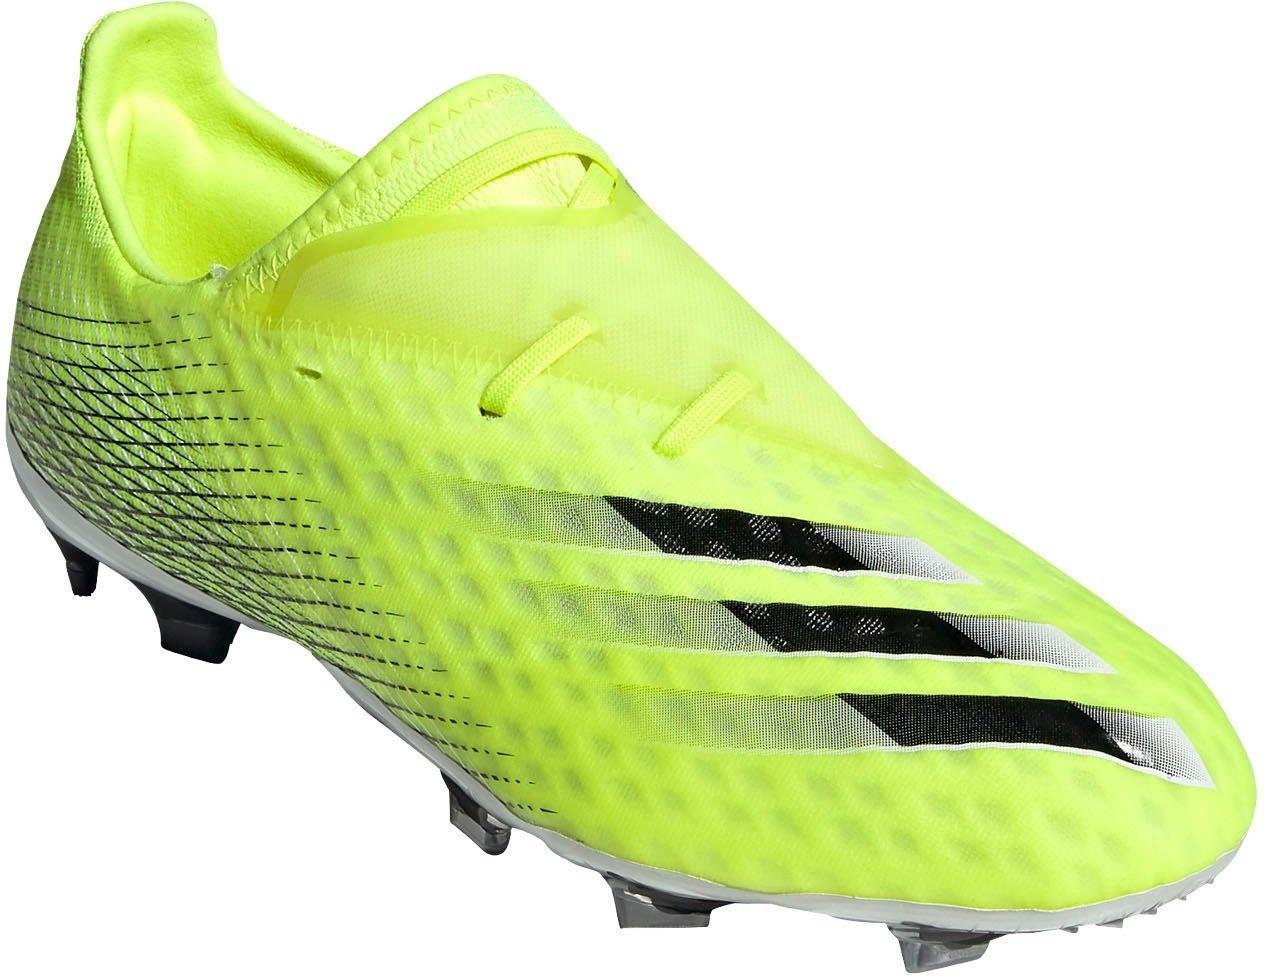 adidas Performance voetbalschoenen »X GHOSTED 2 FG« - gratis ruilen op otto.nl